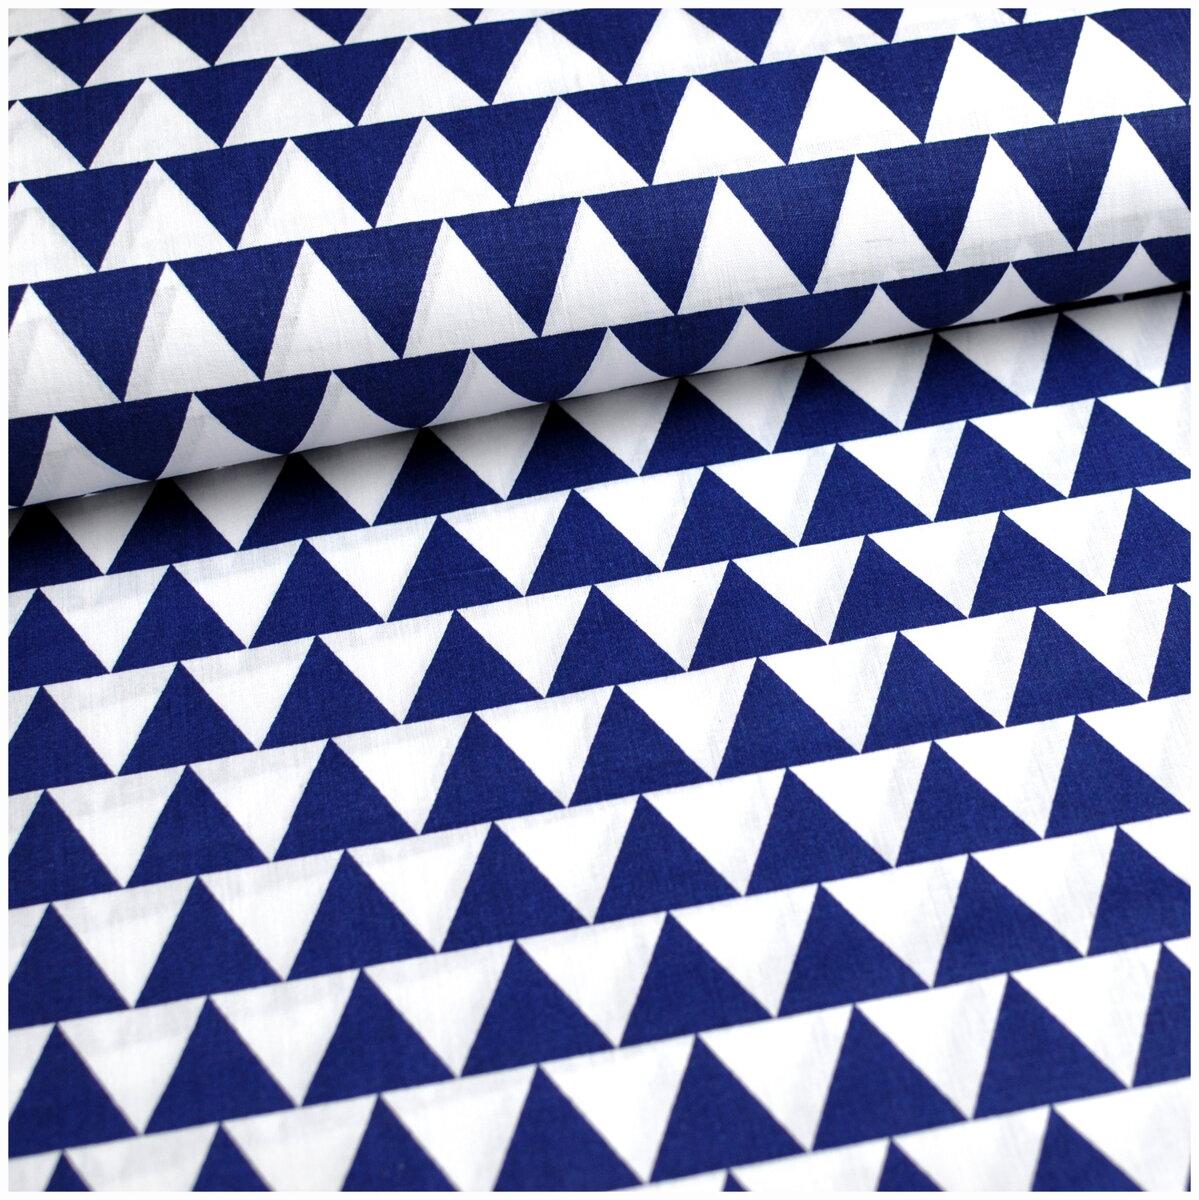 4c060c546920 Trojuholník tmavomodrý malý